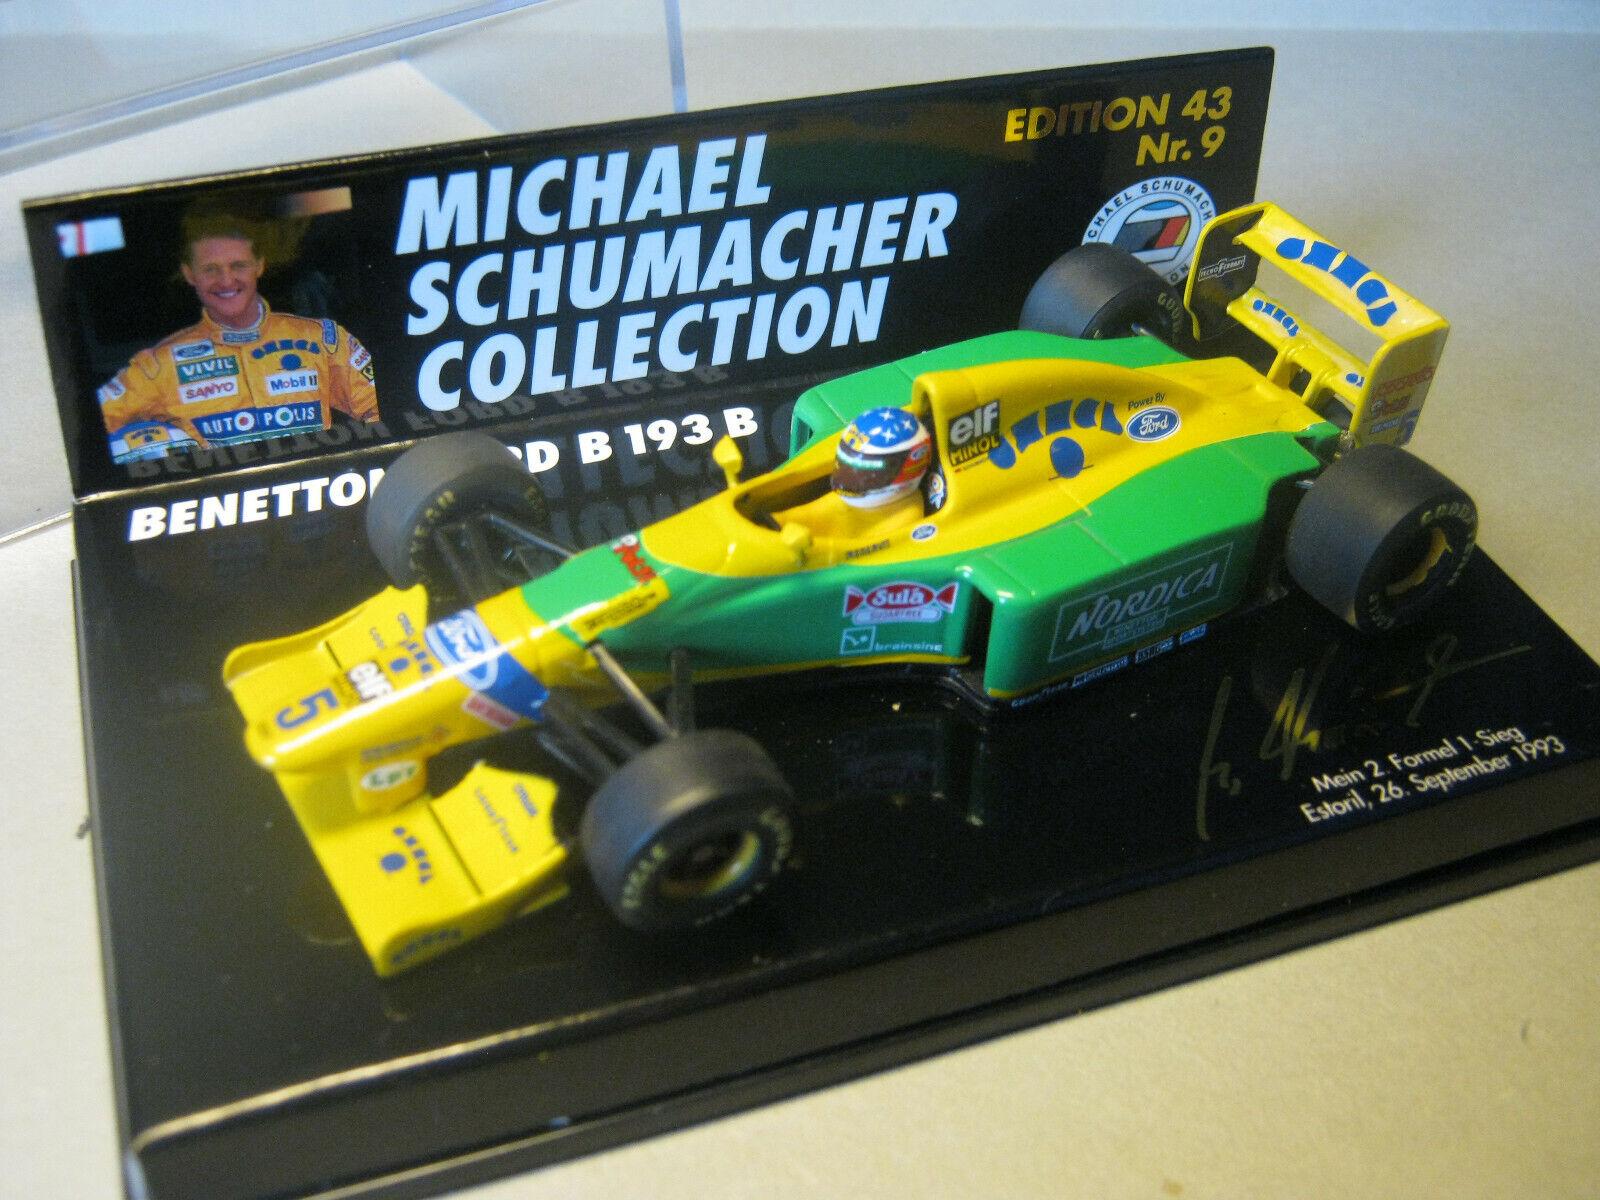 1 43 BENETTON FORD b193 M. Schumacher 1993  Nordica  Minichamps msc430009 NEW